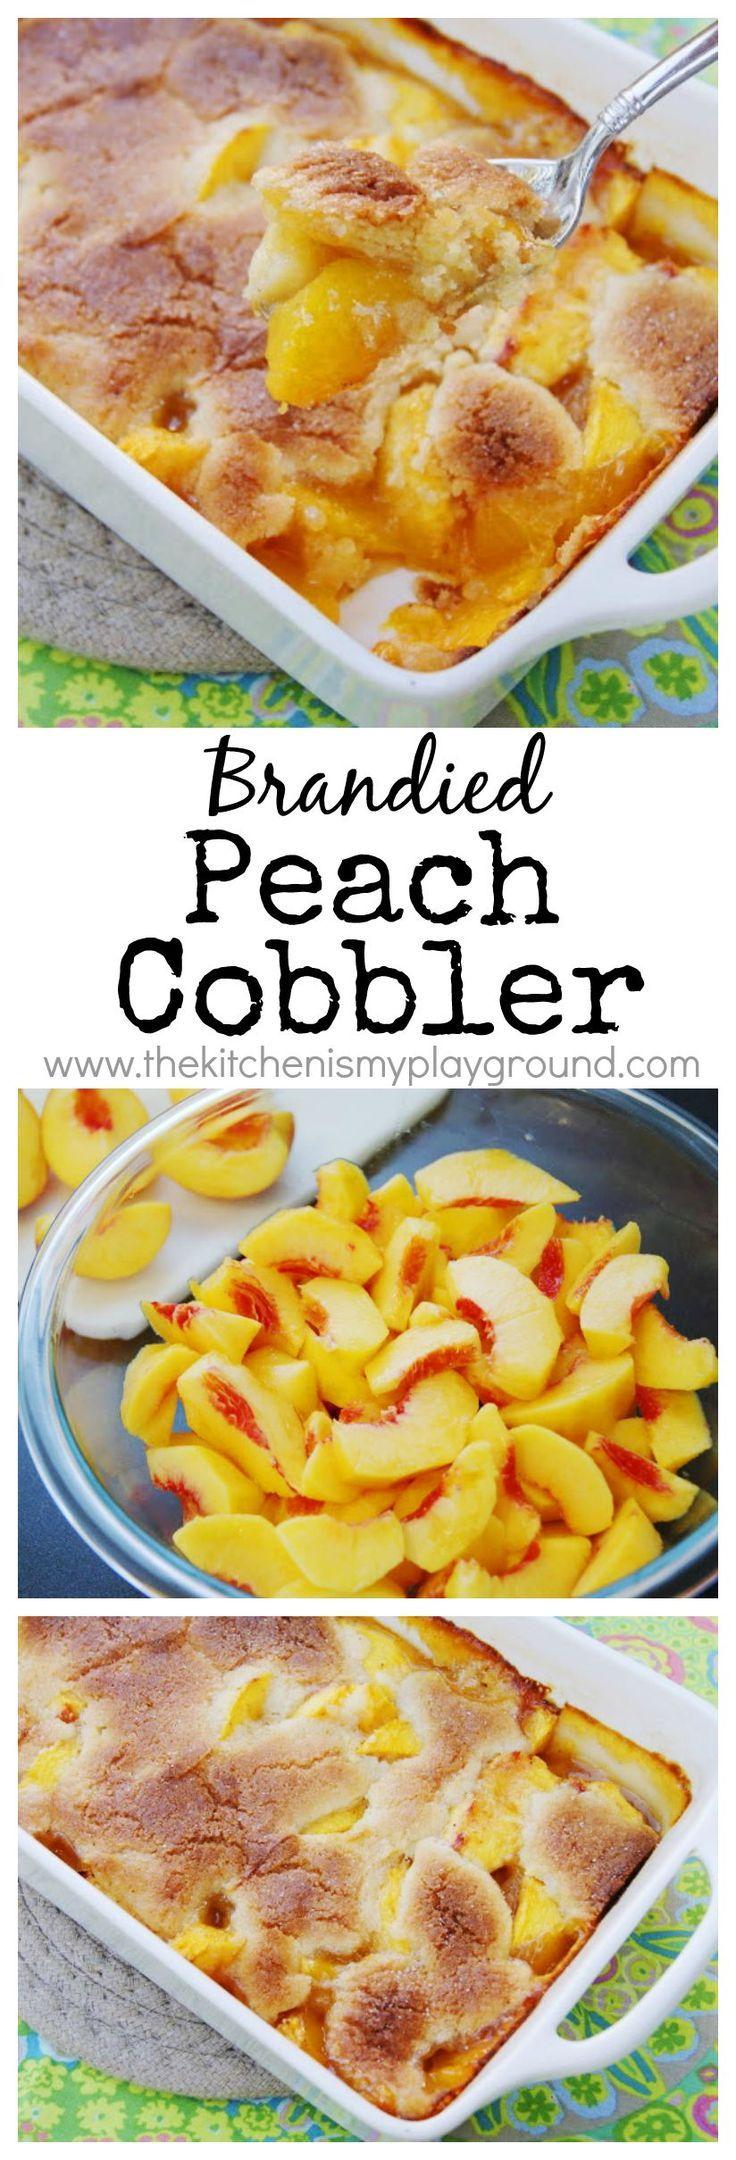 Brandied peach cobbler the absolute best peach cobbler